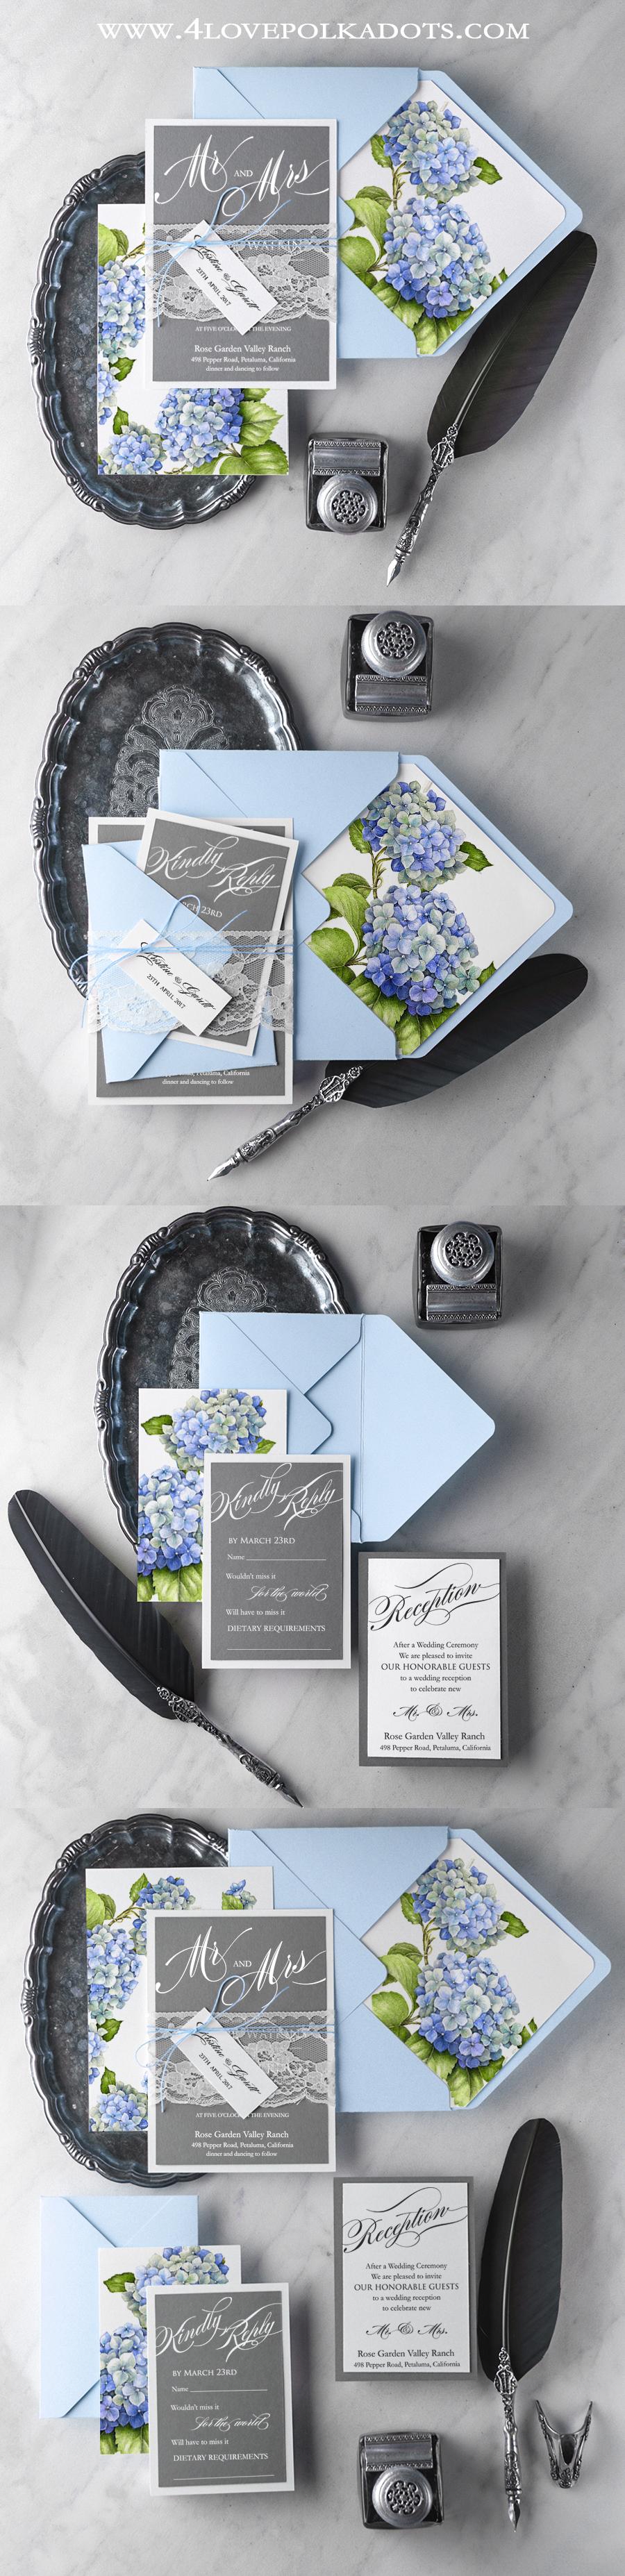 Floral Wedding Invitations #weddinginvitations #stationery #weddinginspirations